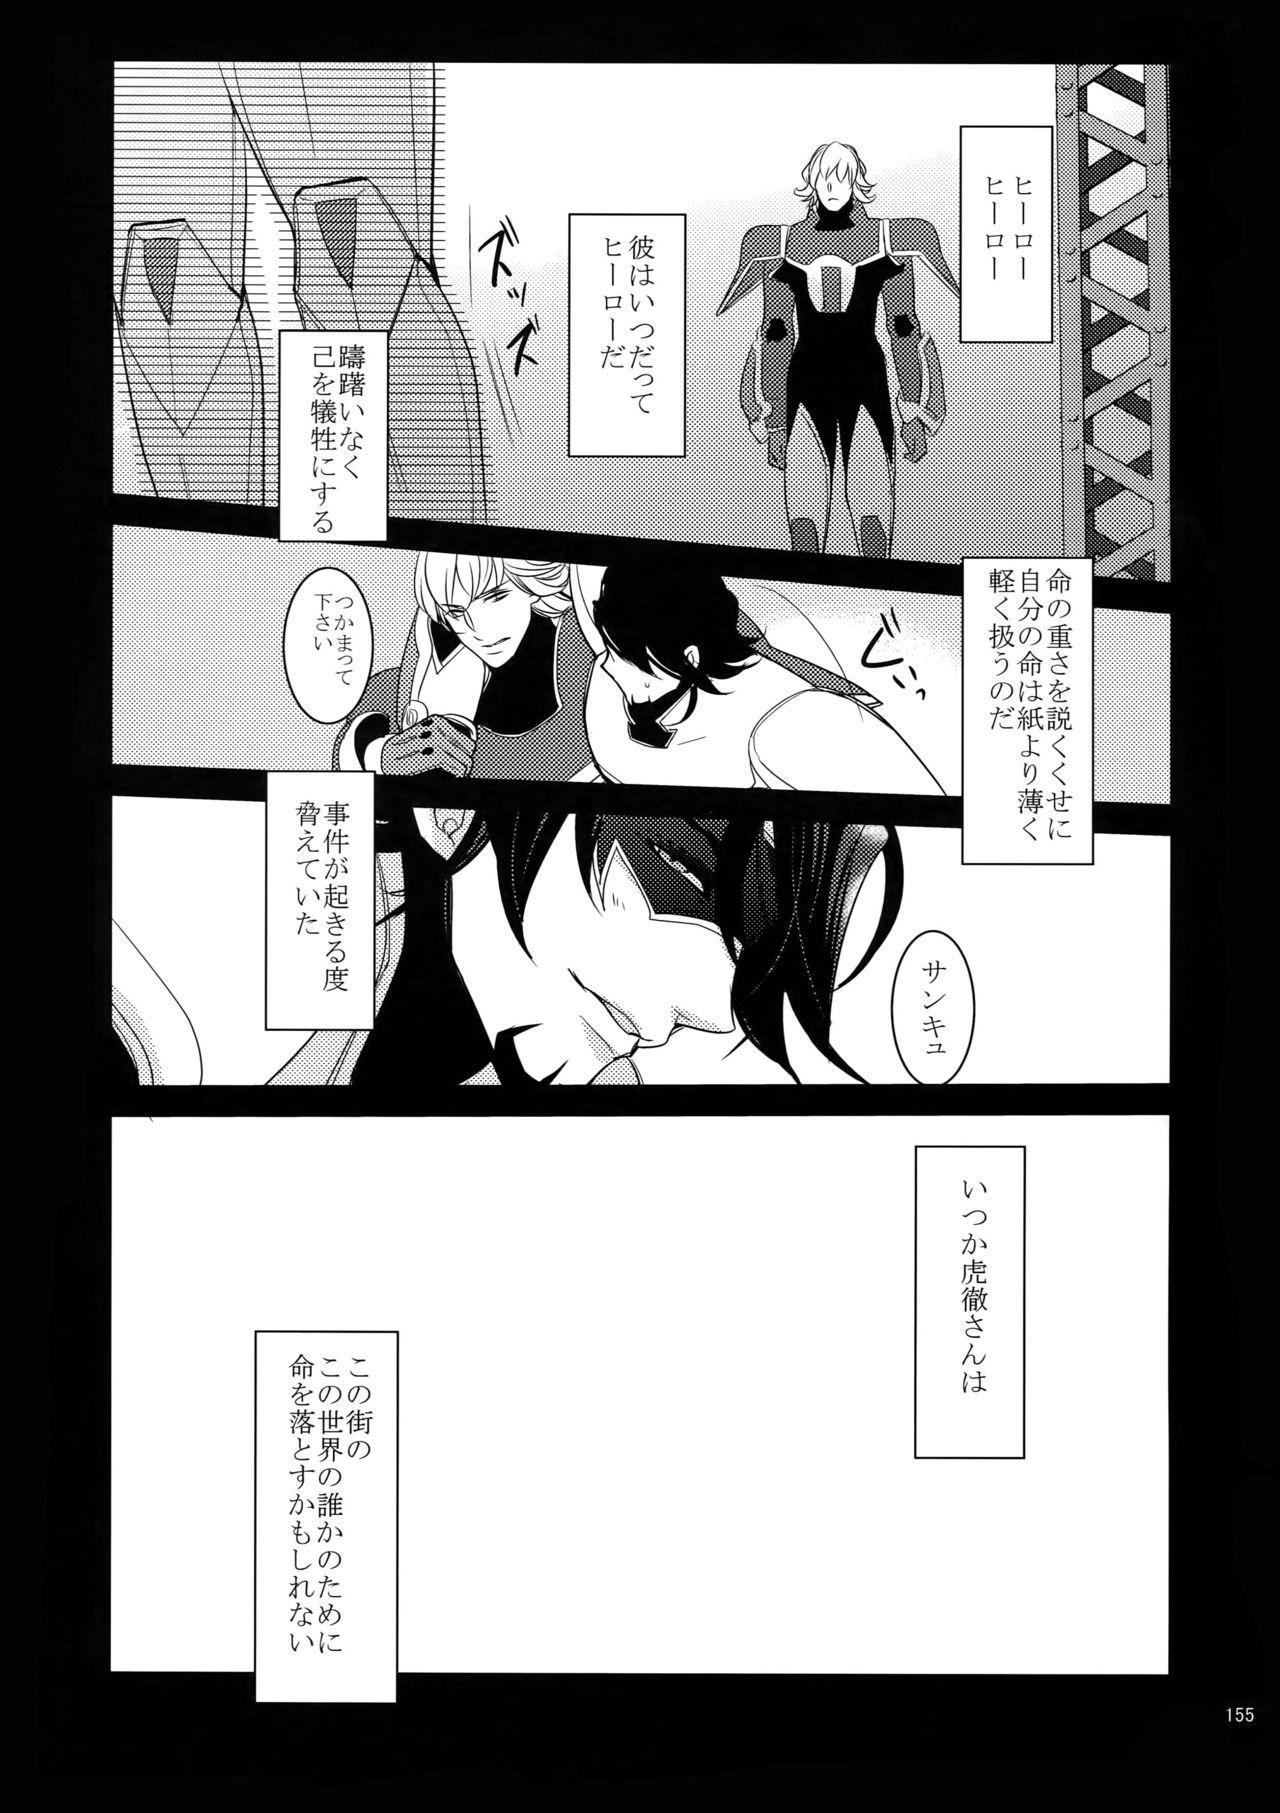 BOROZS Usagi Tora Sairoku 153